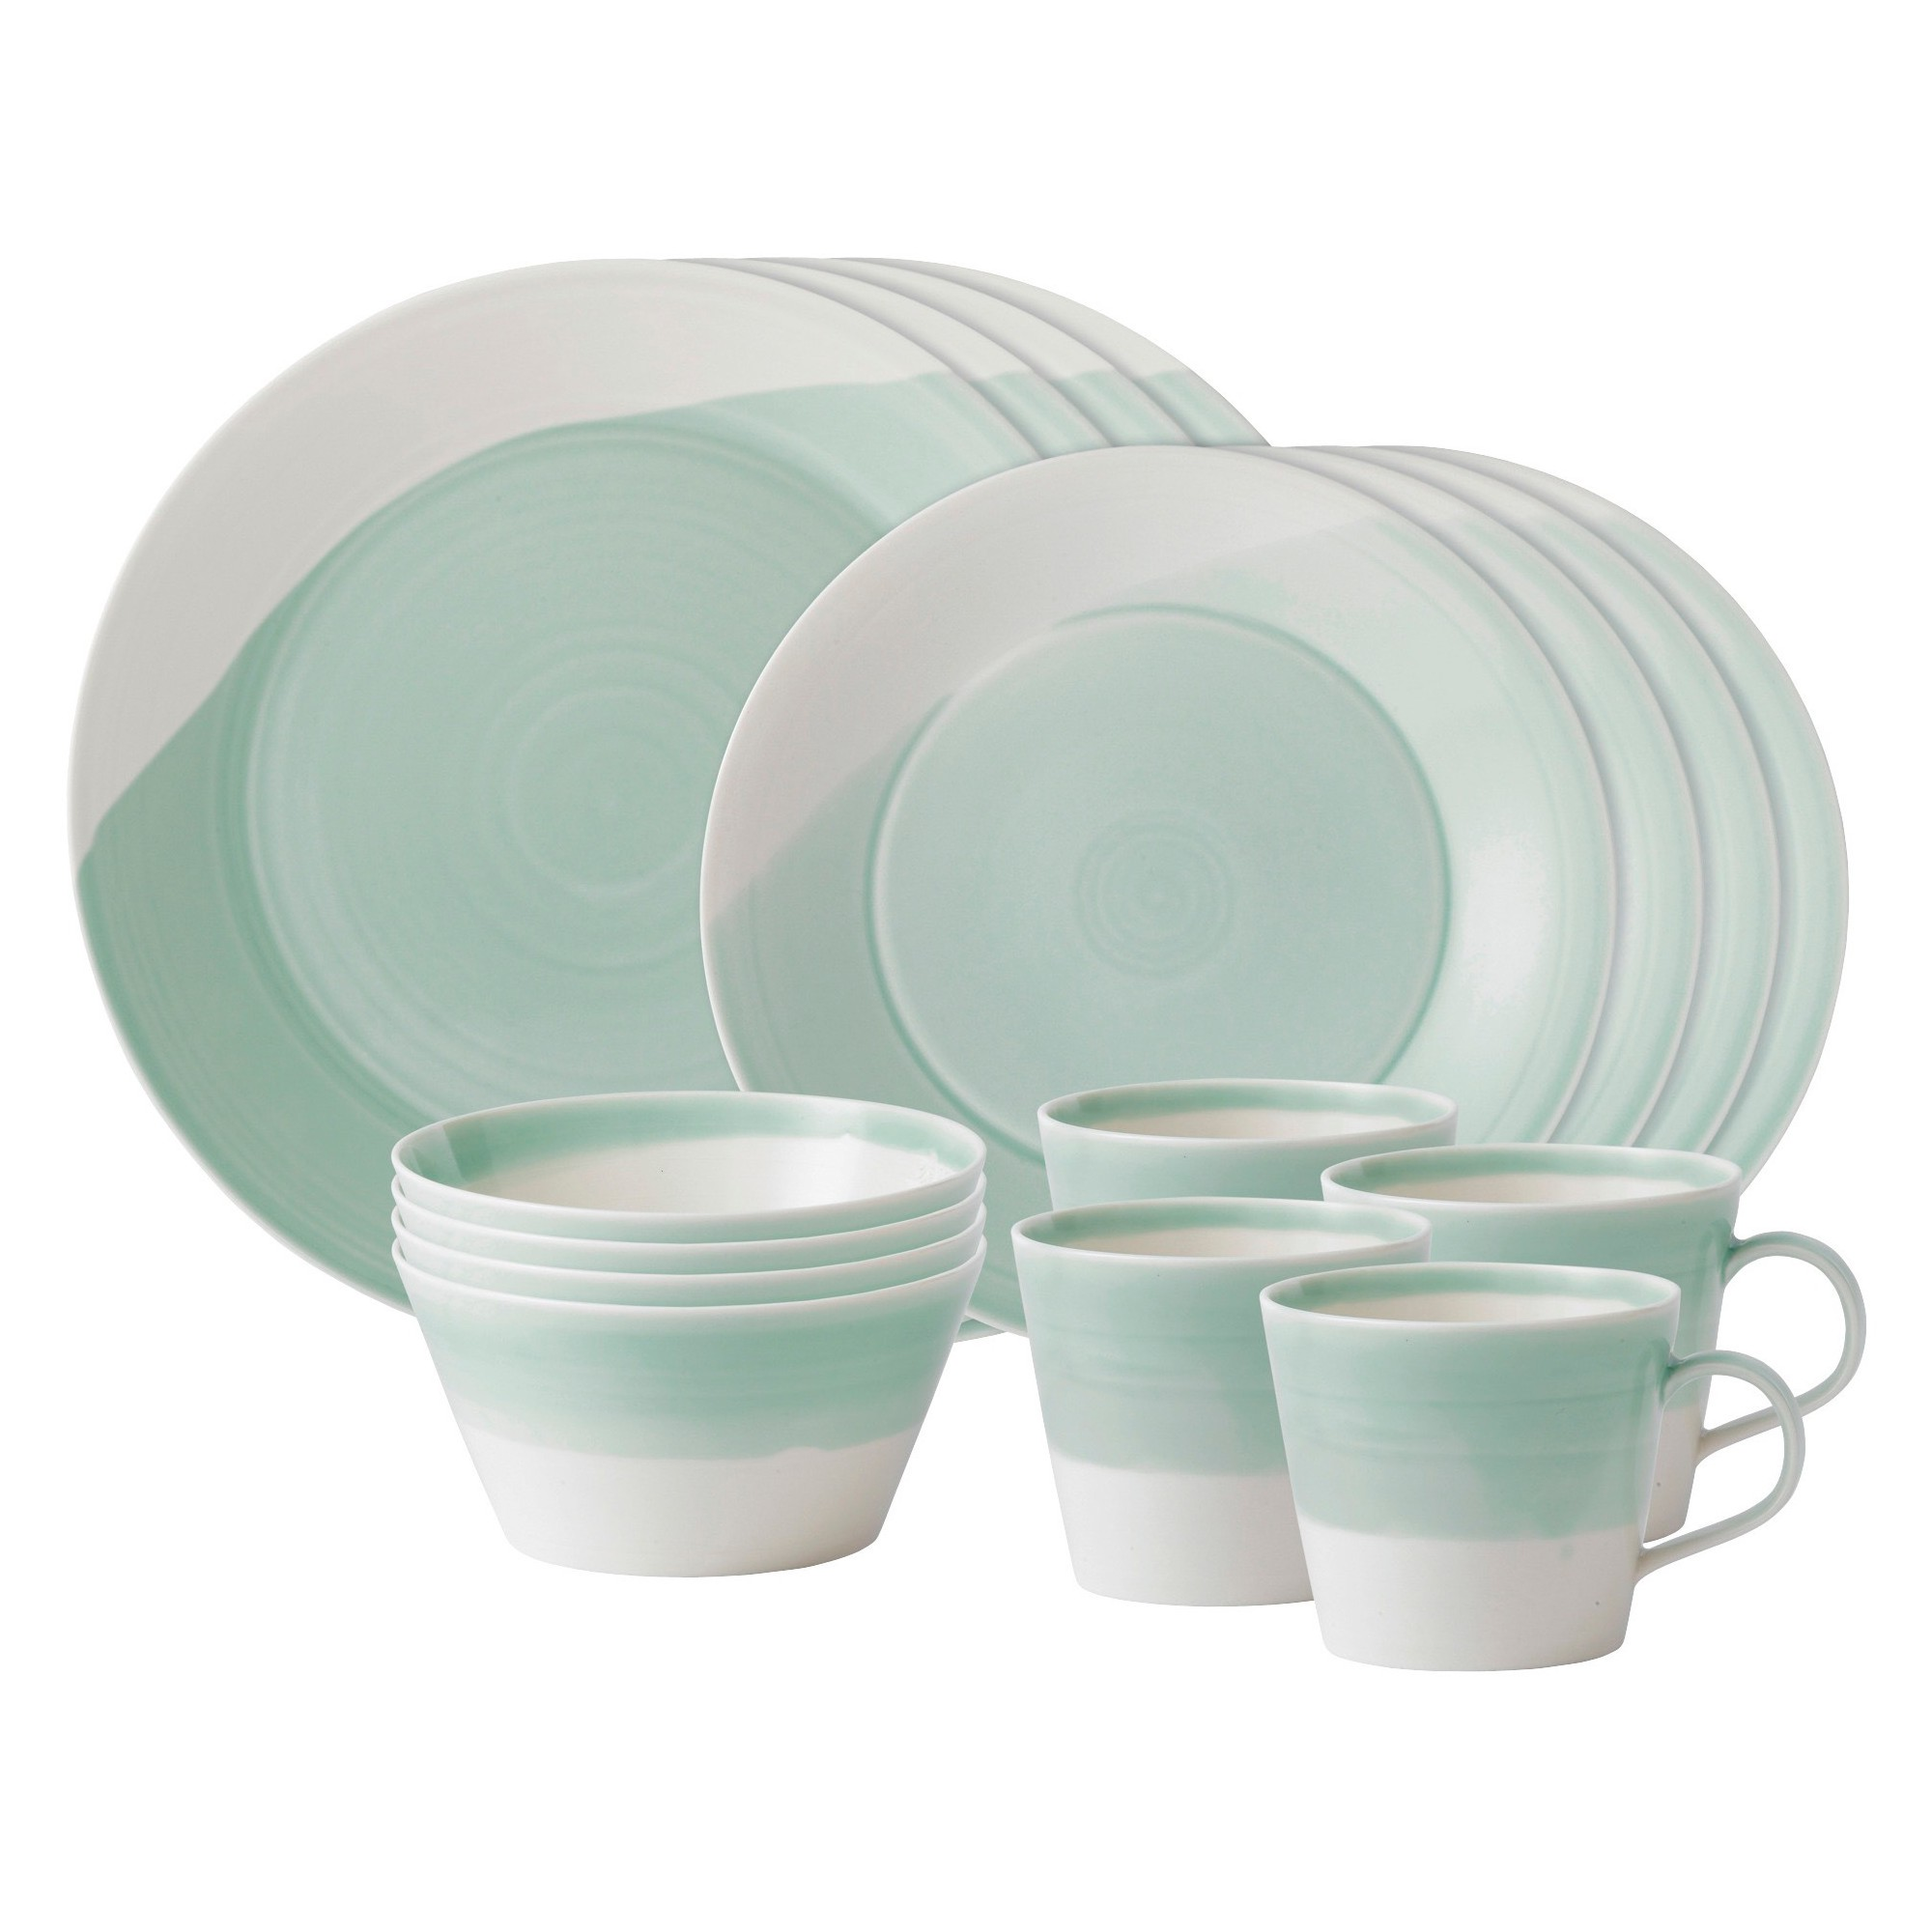 Royal Doulton 1815 Porcelain 16pc Dinnerware Set Green